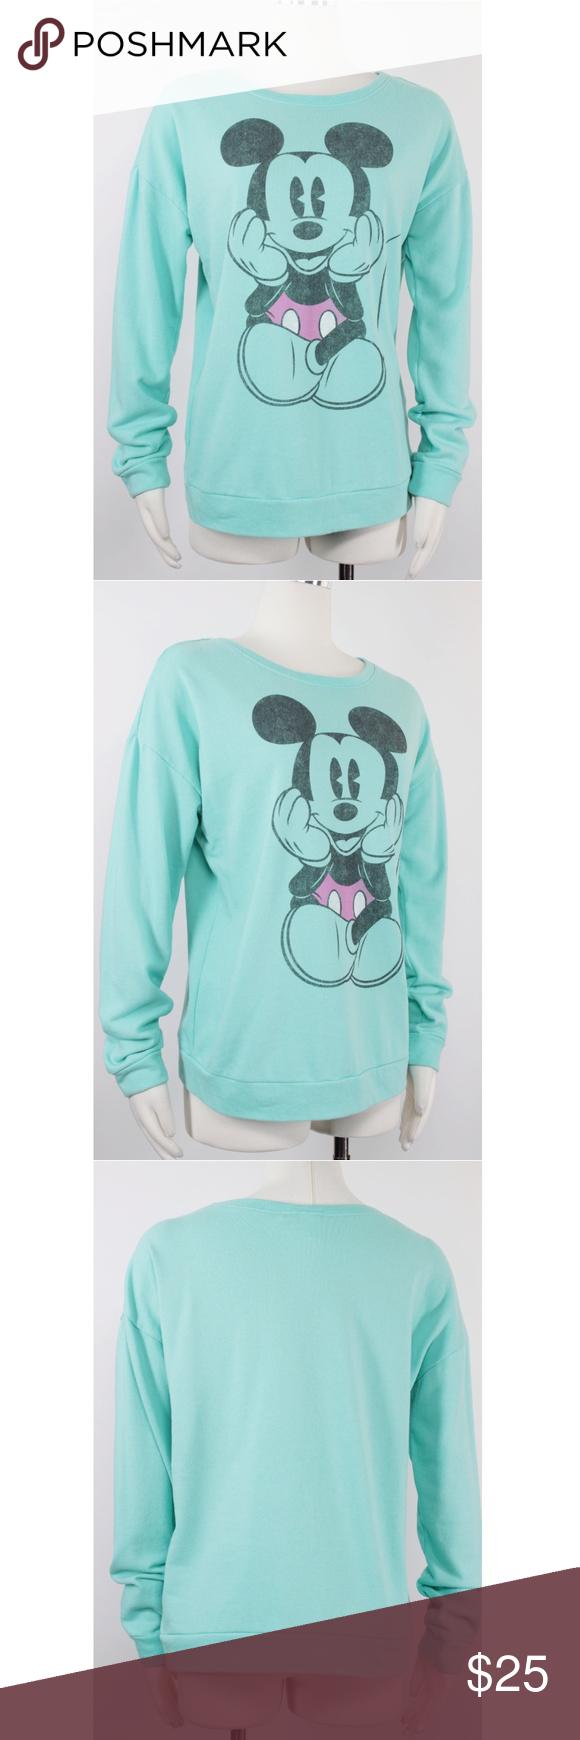 Disney   Mint Green Mickey Mouse Sweatshirt 1052 Disney